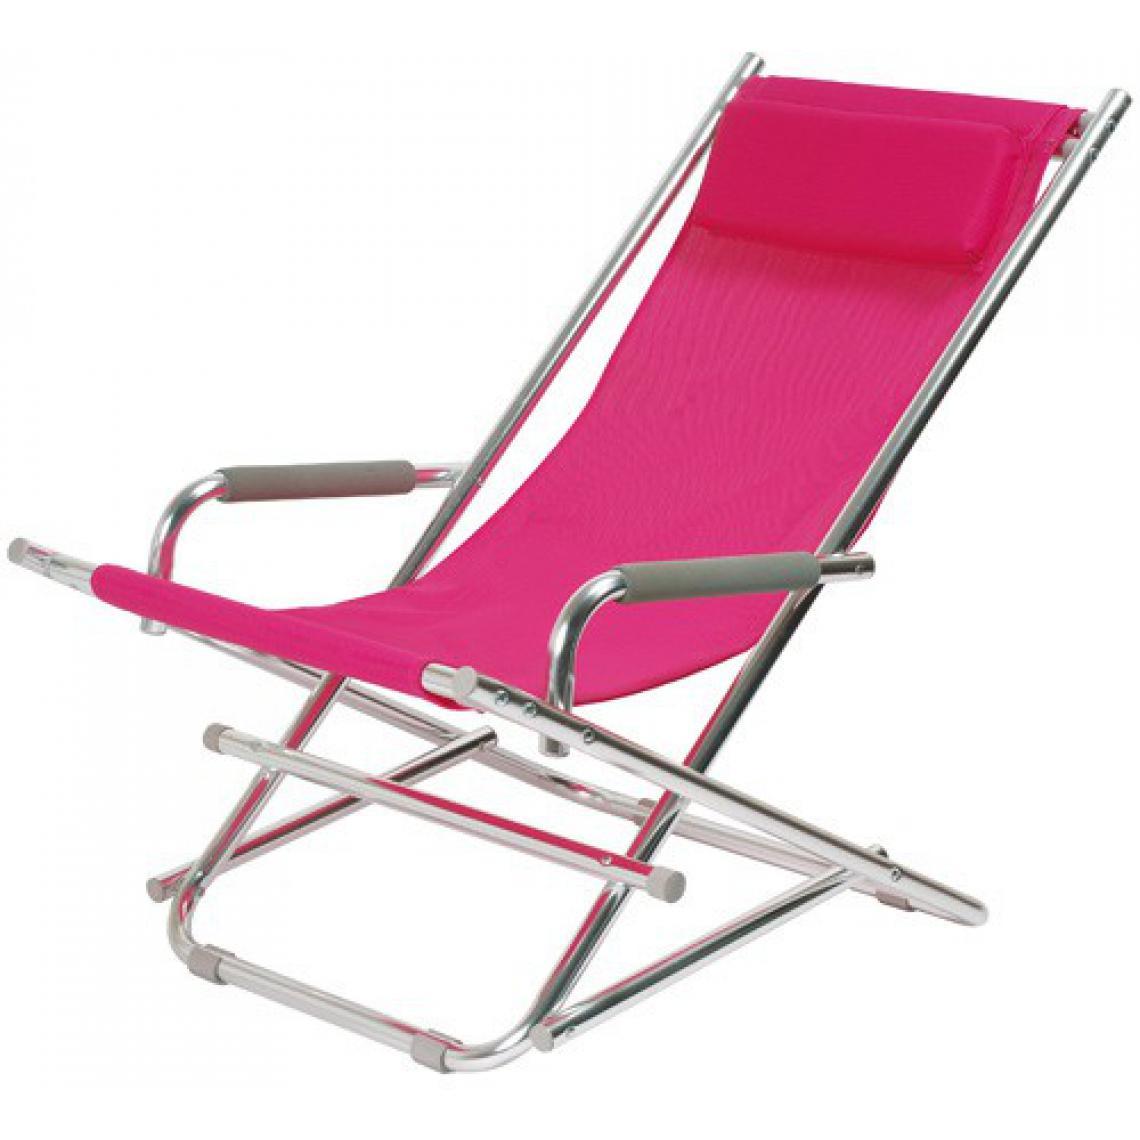 chaise longue la chaise longue rose ajania